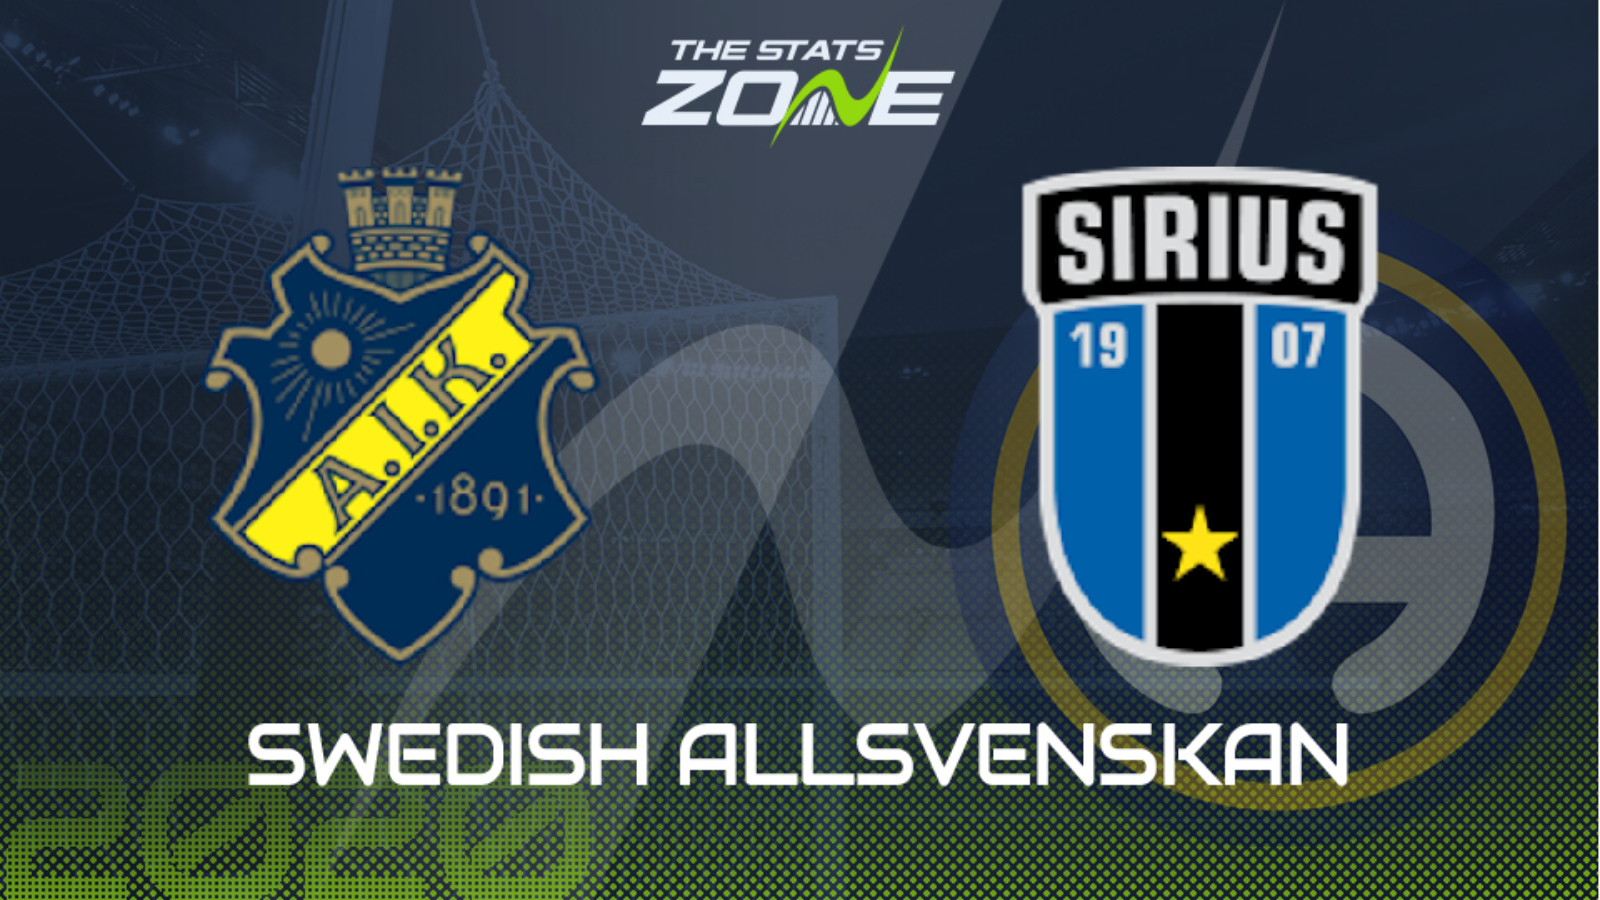 2020 Swedish Allsvenskan Aik Vs Sirius Preview Prediction The Stats Zone